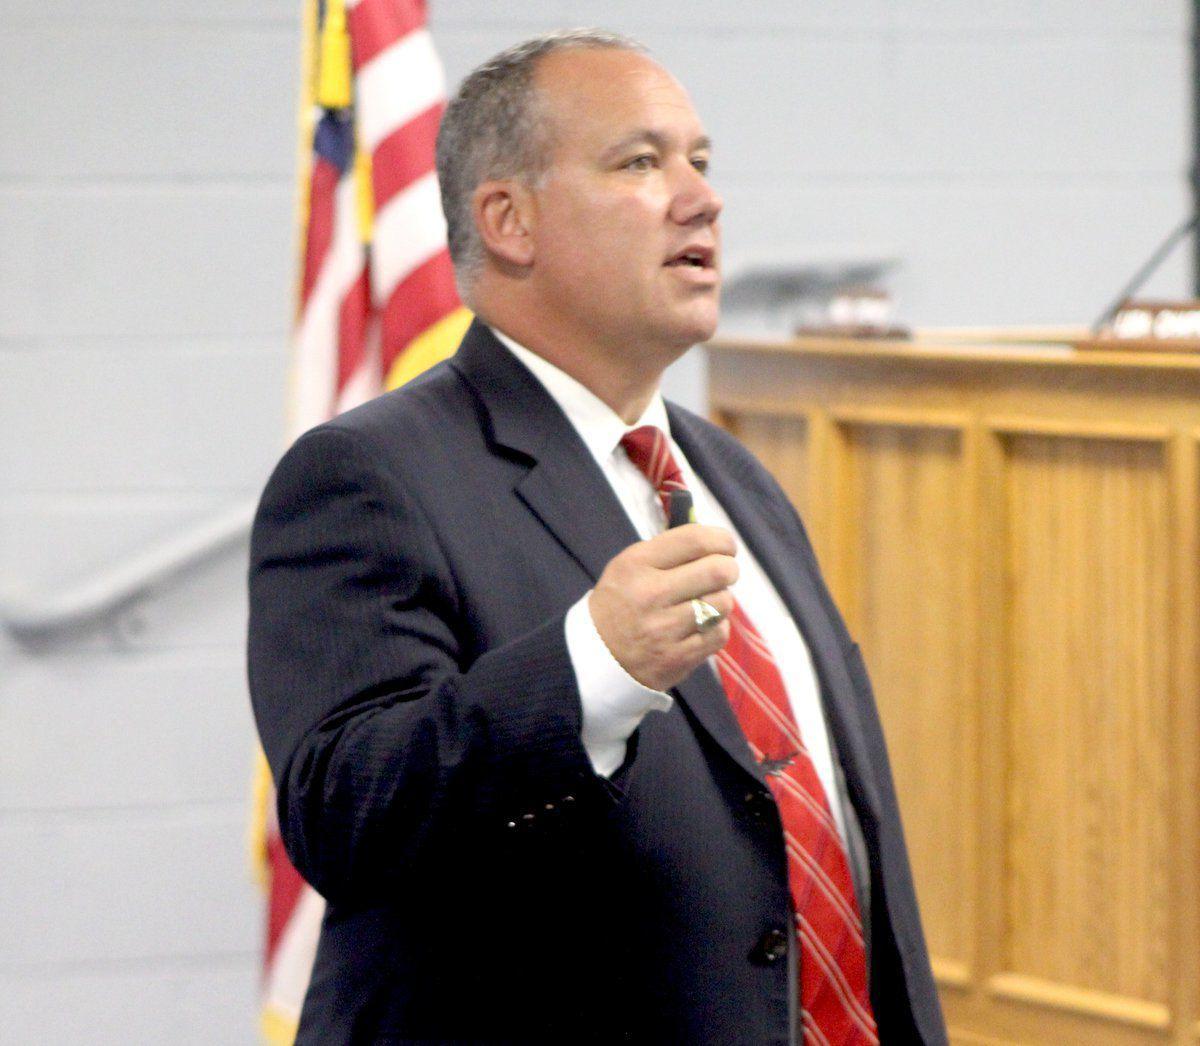 School board raises tax rate 2.4 cents